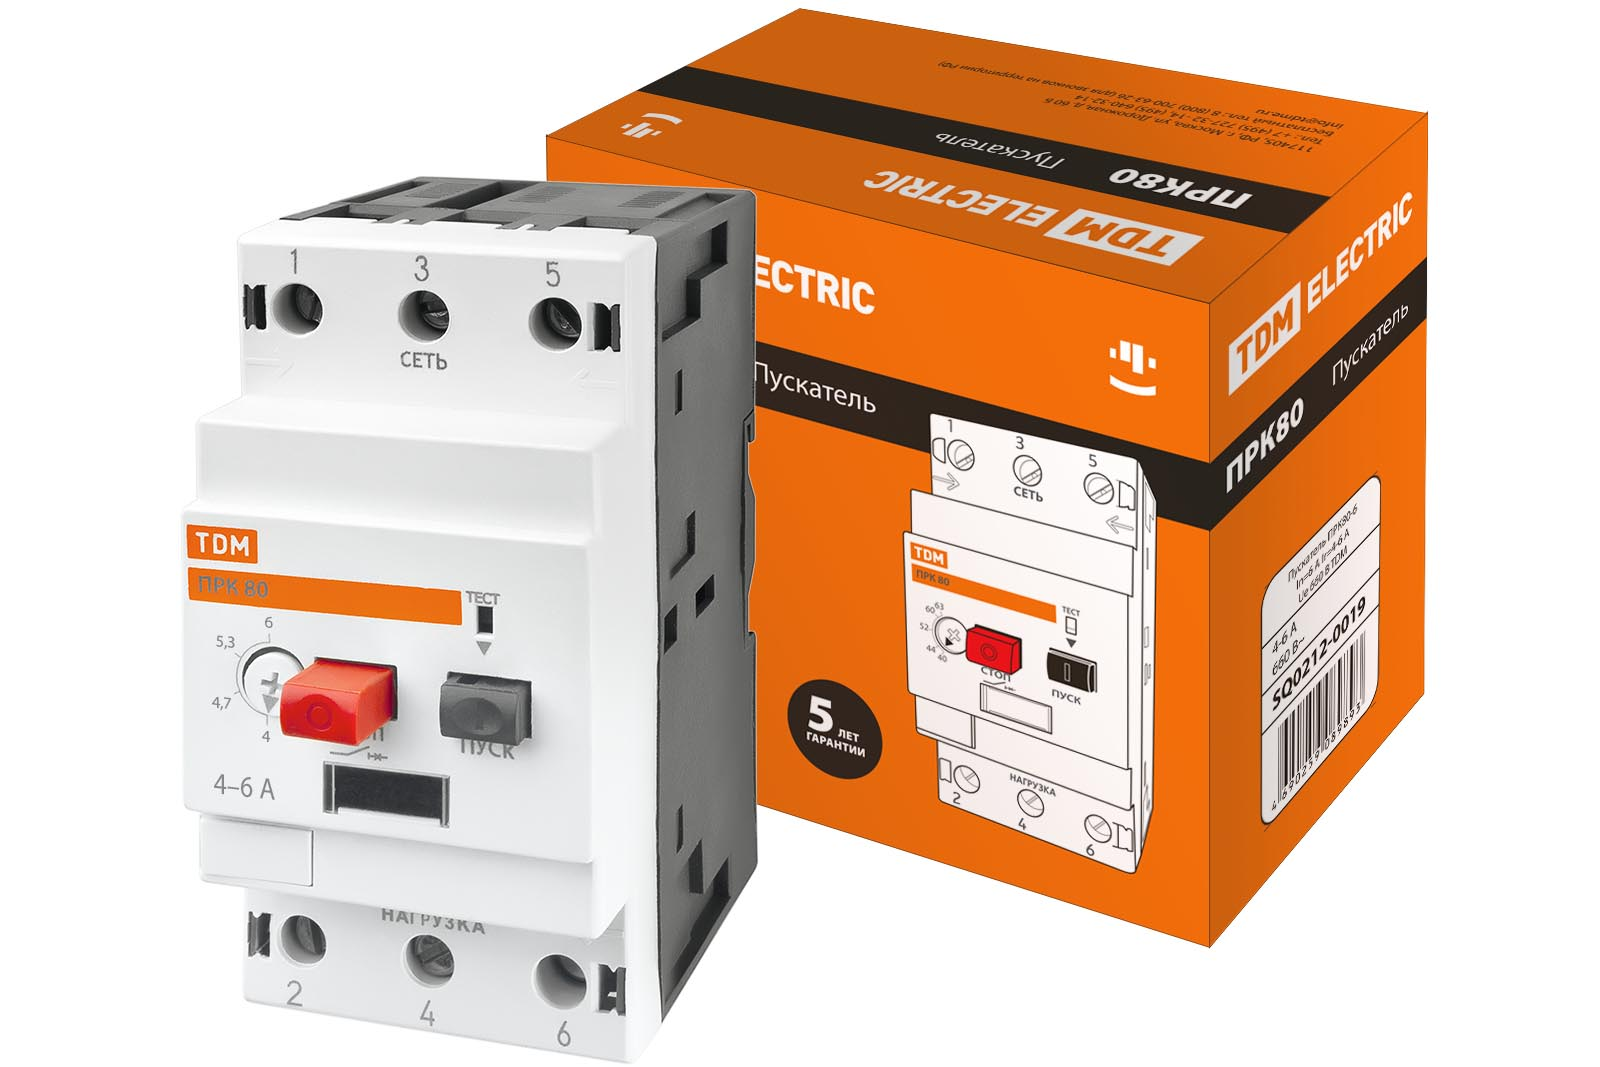 Пускатель Tdm Sq0212-0019 реле tdm sq0712 0019